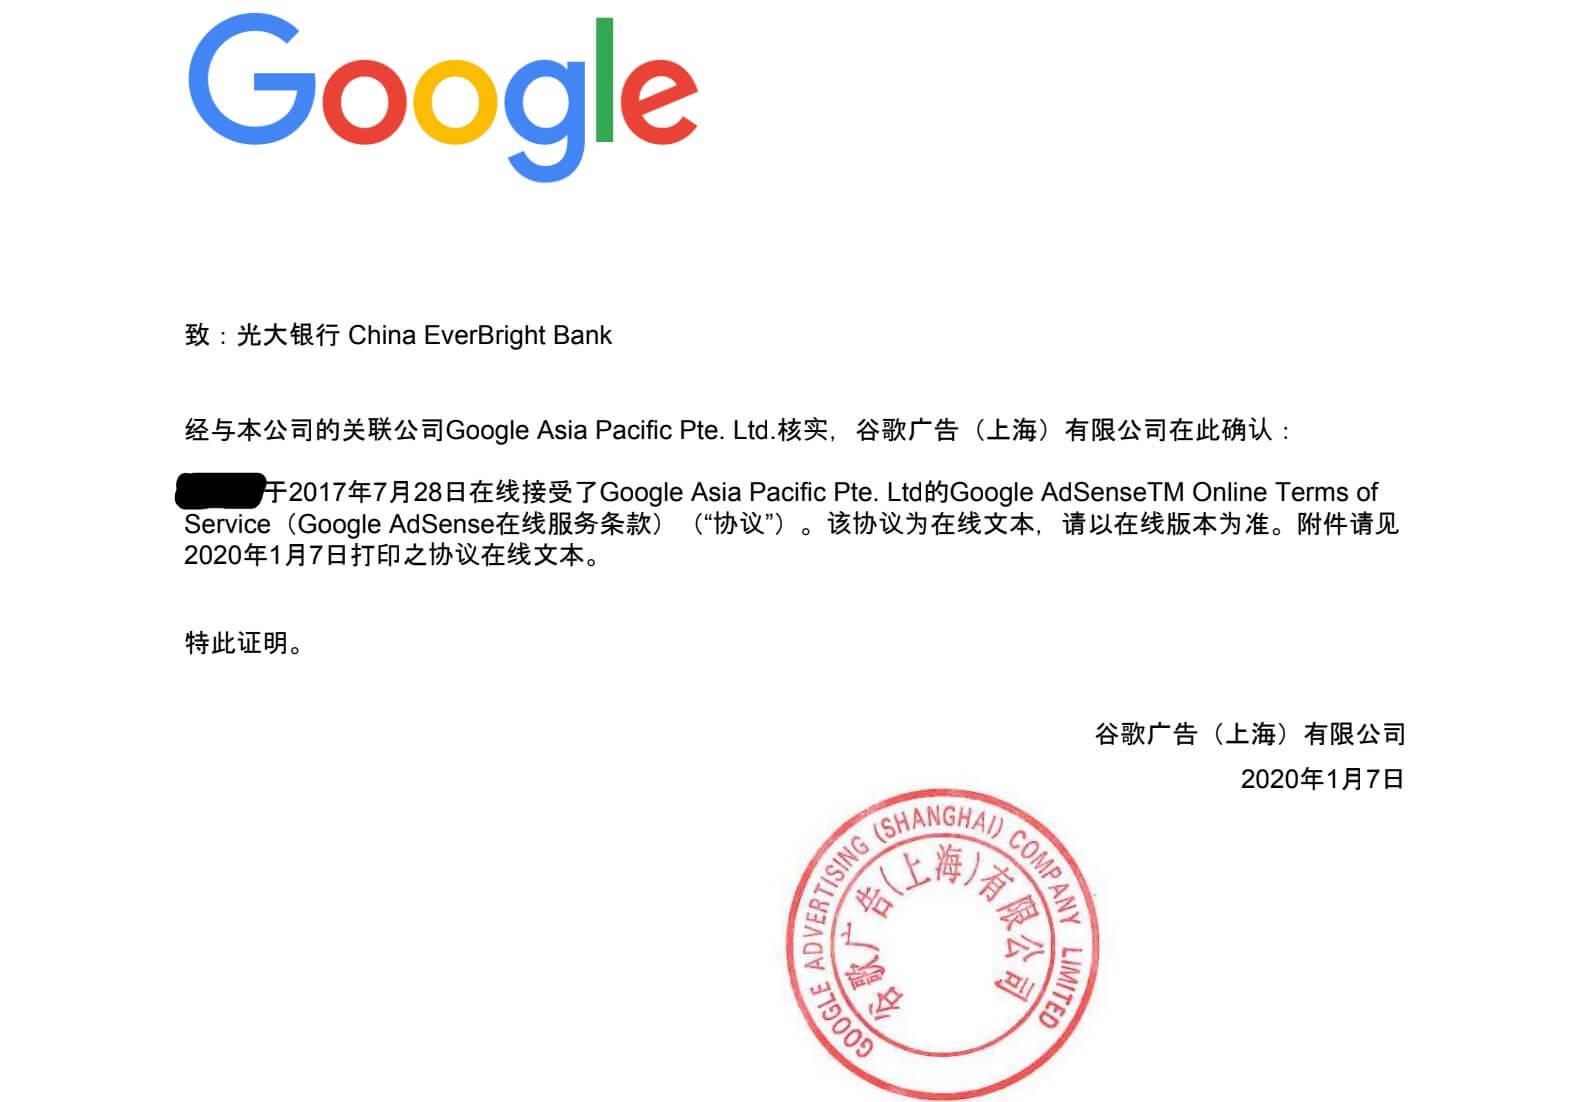 Google AdSense 带公章的合同